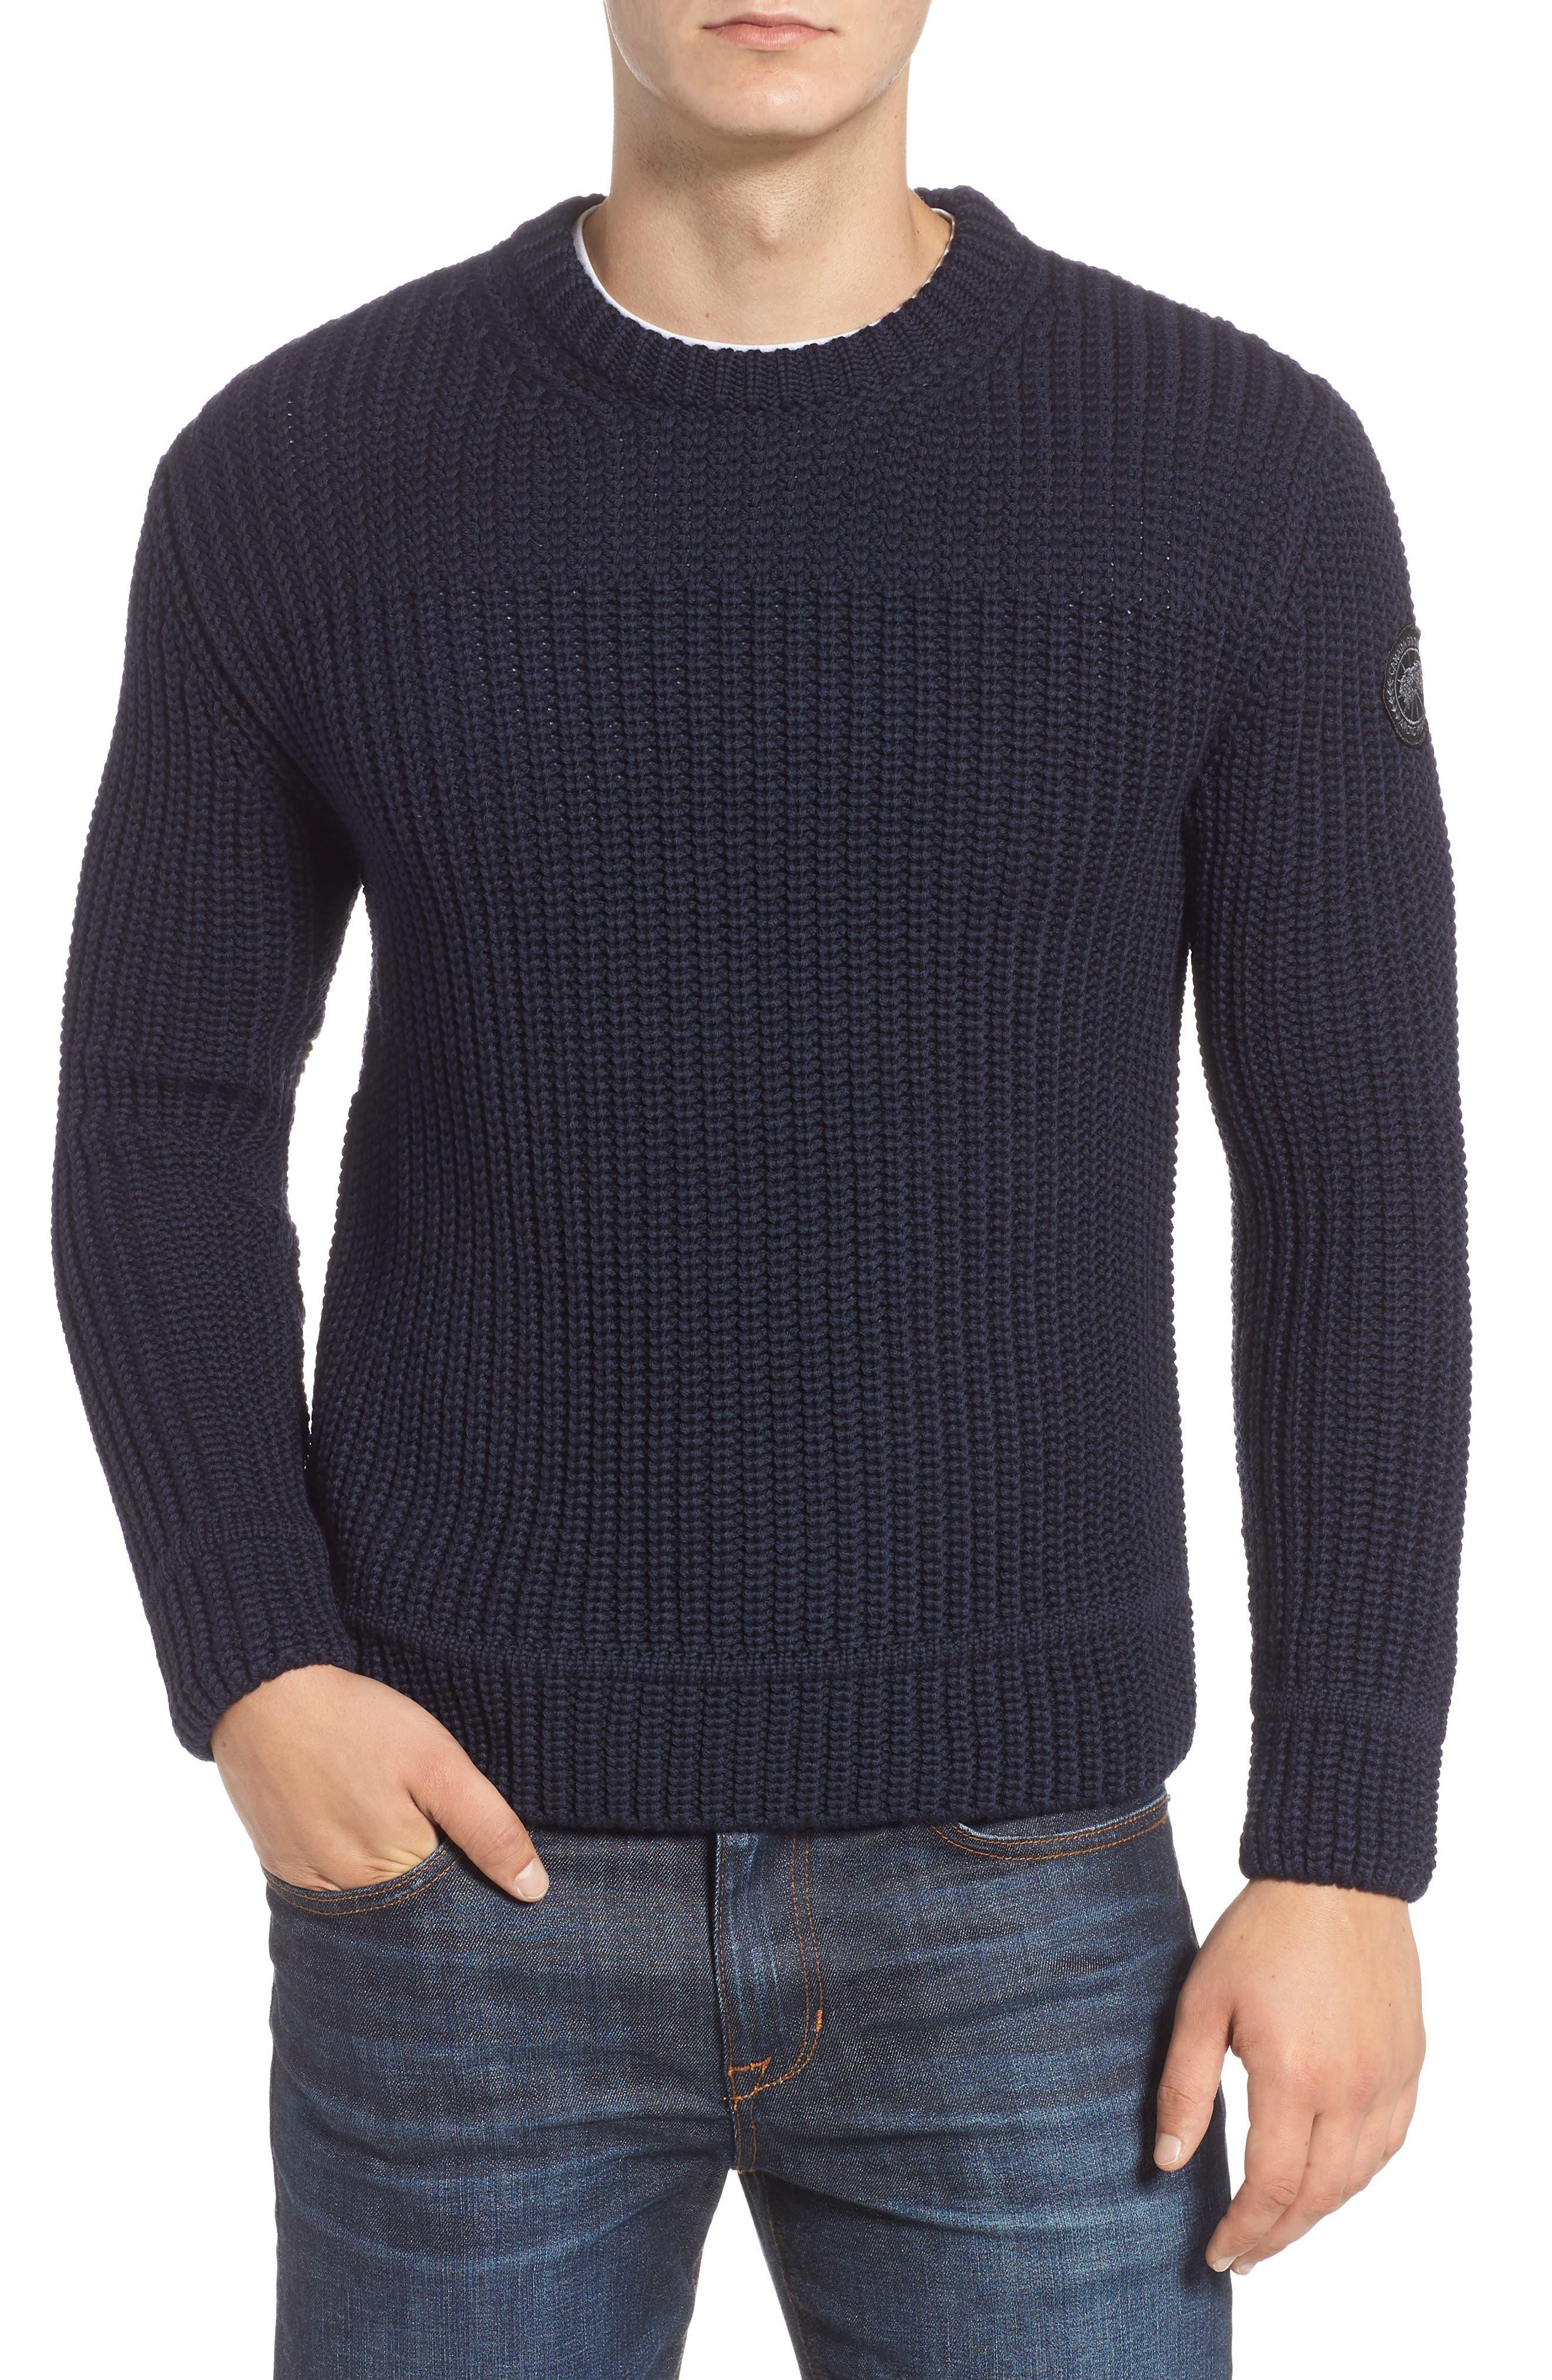 Galloway Regular Fit Merino Wool Sweater in Navy